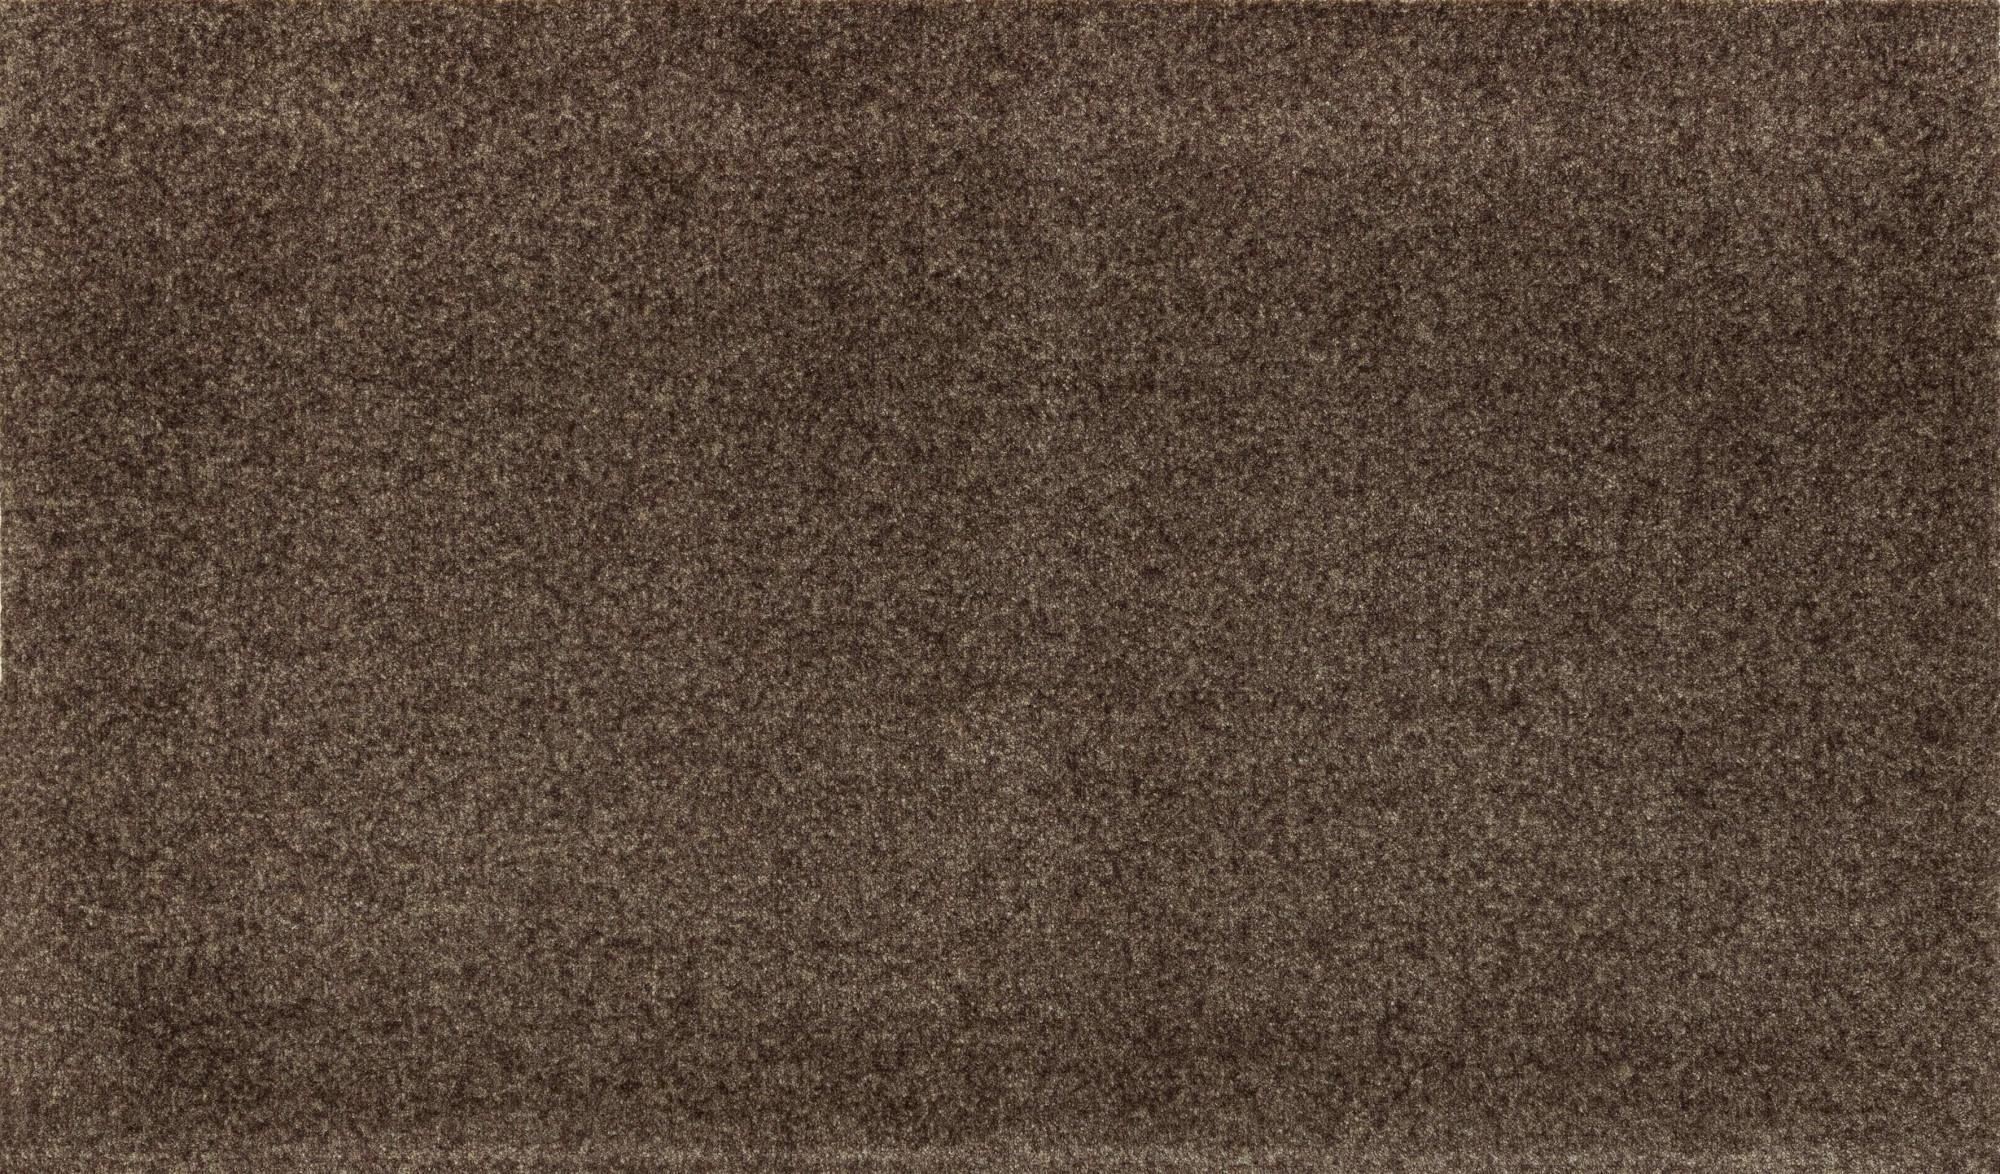 wash dry espresso brown waschbarer teppich. Black Bedroom Furniture Sets. Home Design Ideas